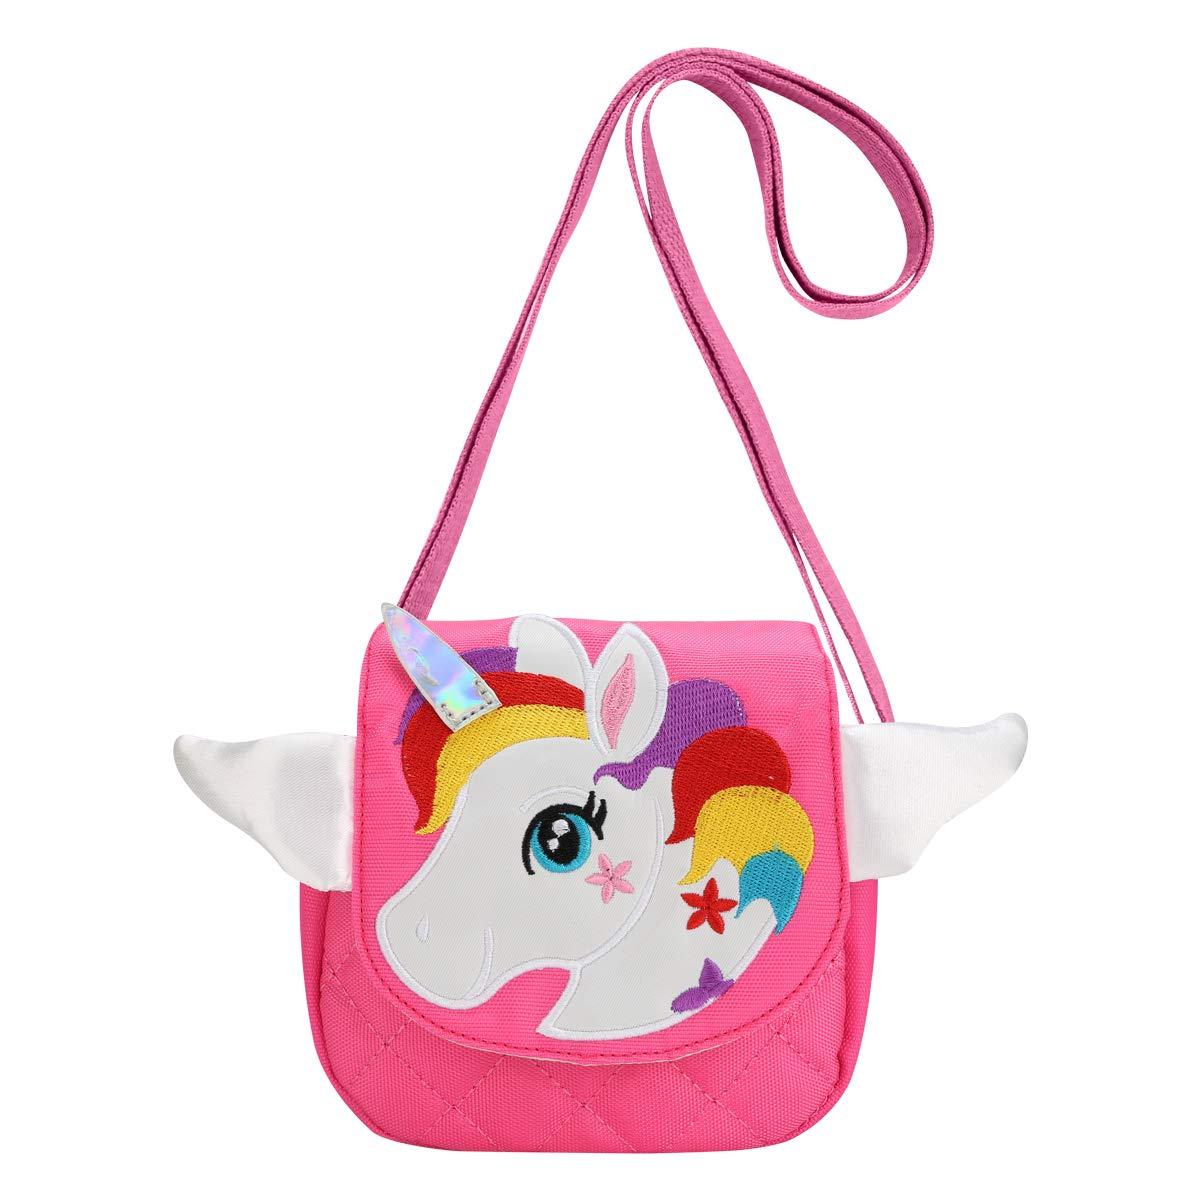 DEEKEY Little Girls Purses for Kids - Toddler Mini Cute Princess Handbags Shoulder Messenger Bag Toys Gifts Crossbody Purse